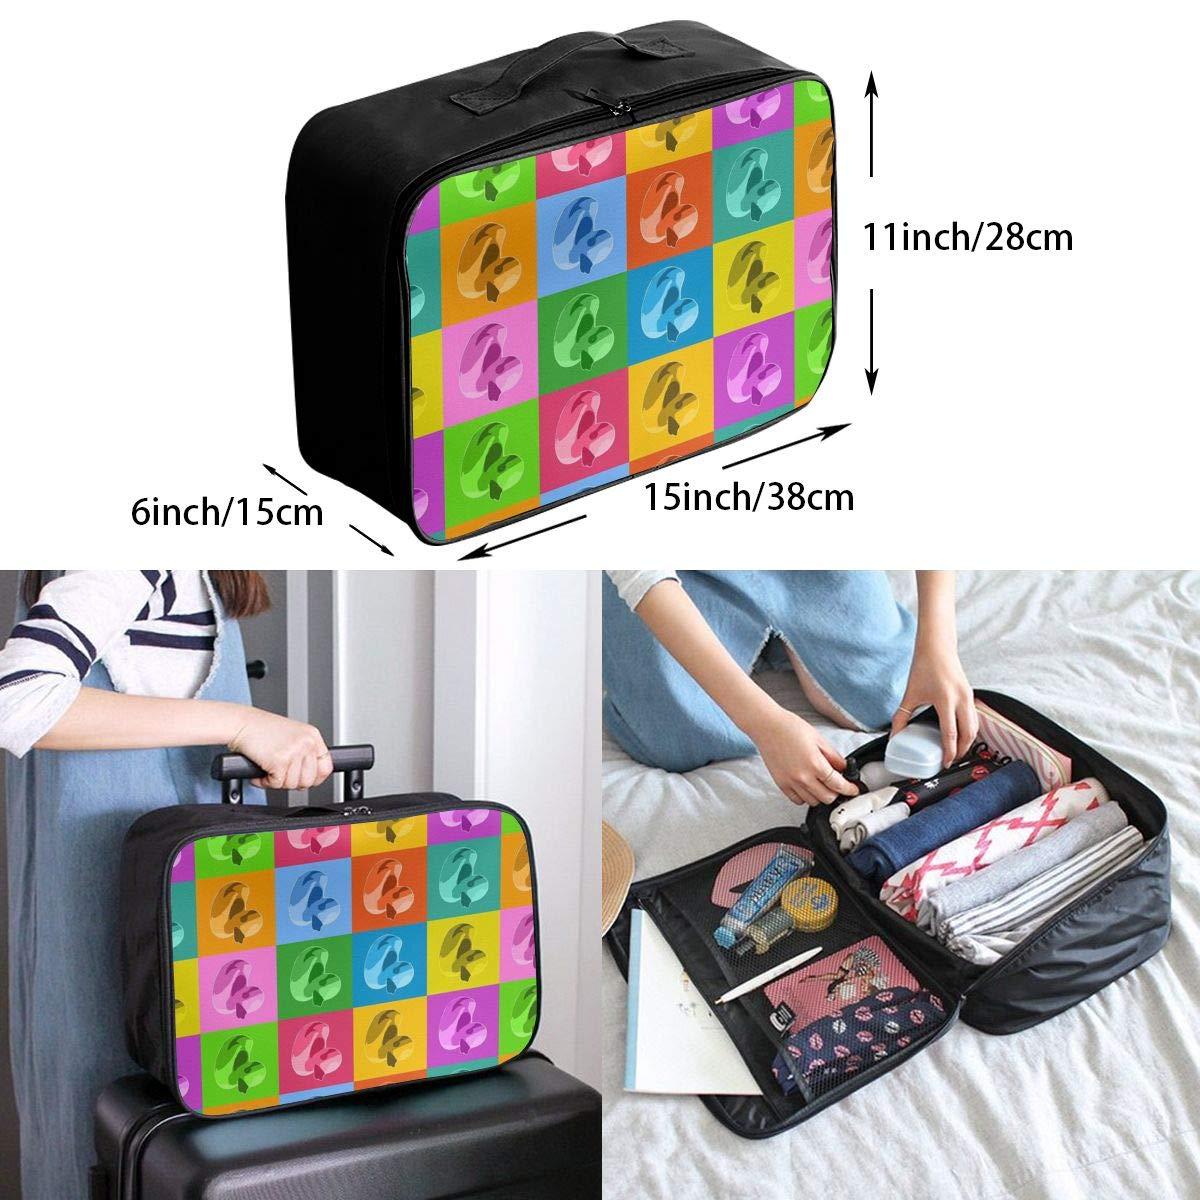 Travel Luggage Duffle Bag Lightweight Portable Handbag Duck Large Capacity Waterproof Foldable Storage Tote